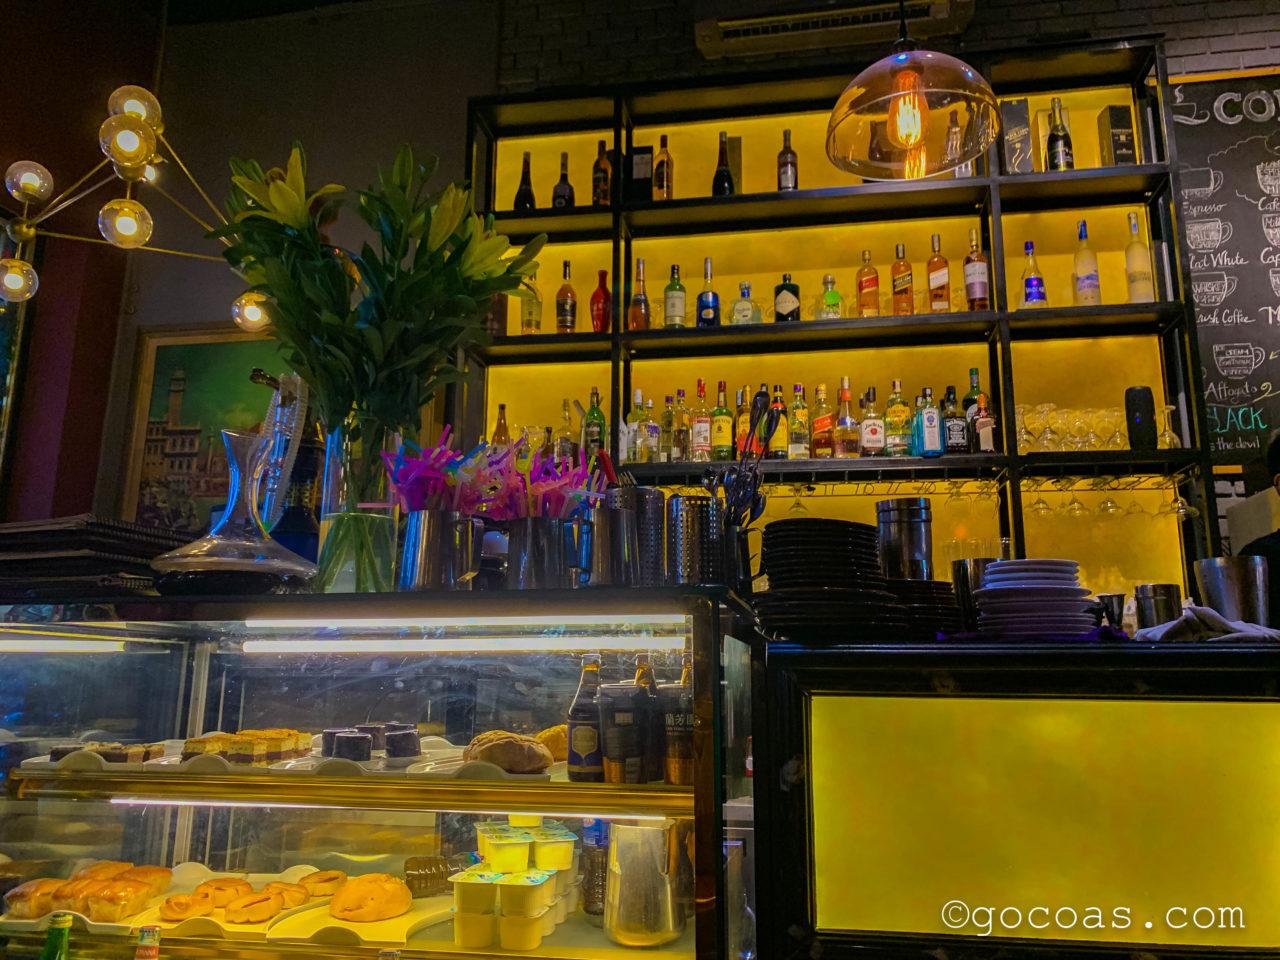 VIVENNE CAFE/restaurant/wine店内